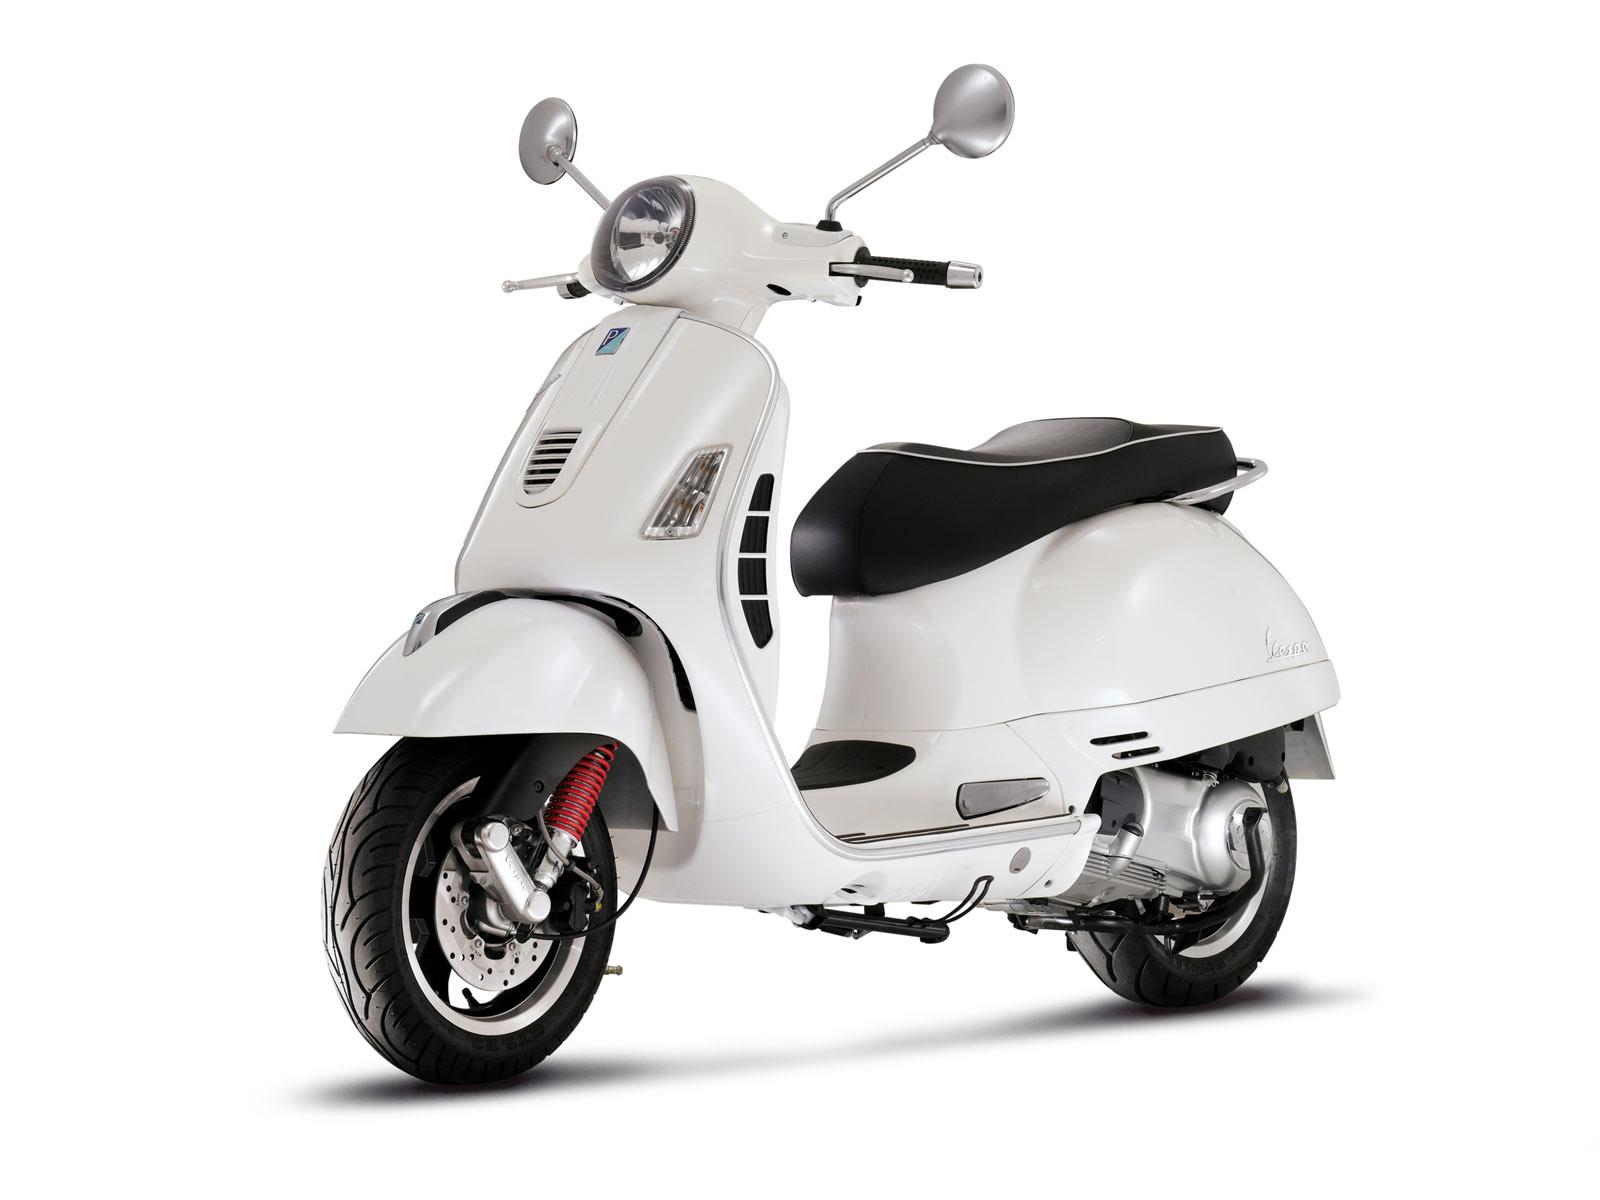 2008 vespa gts 300 super scooter pictures insurance info. Black Bedroom Furniture Sets. Home Design Ideas